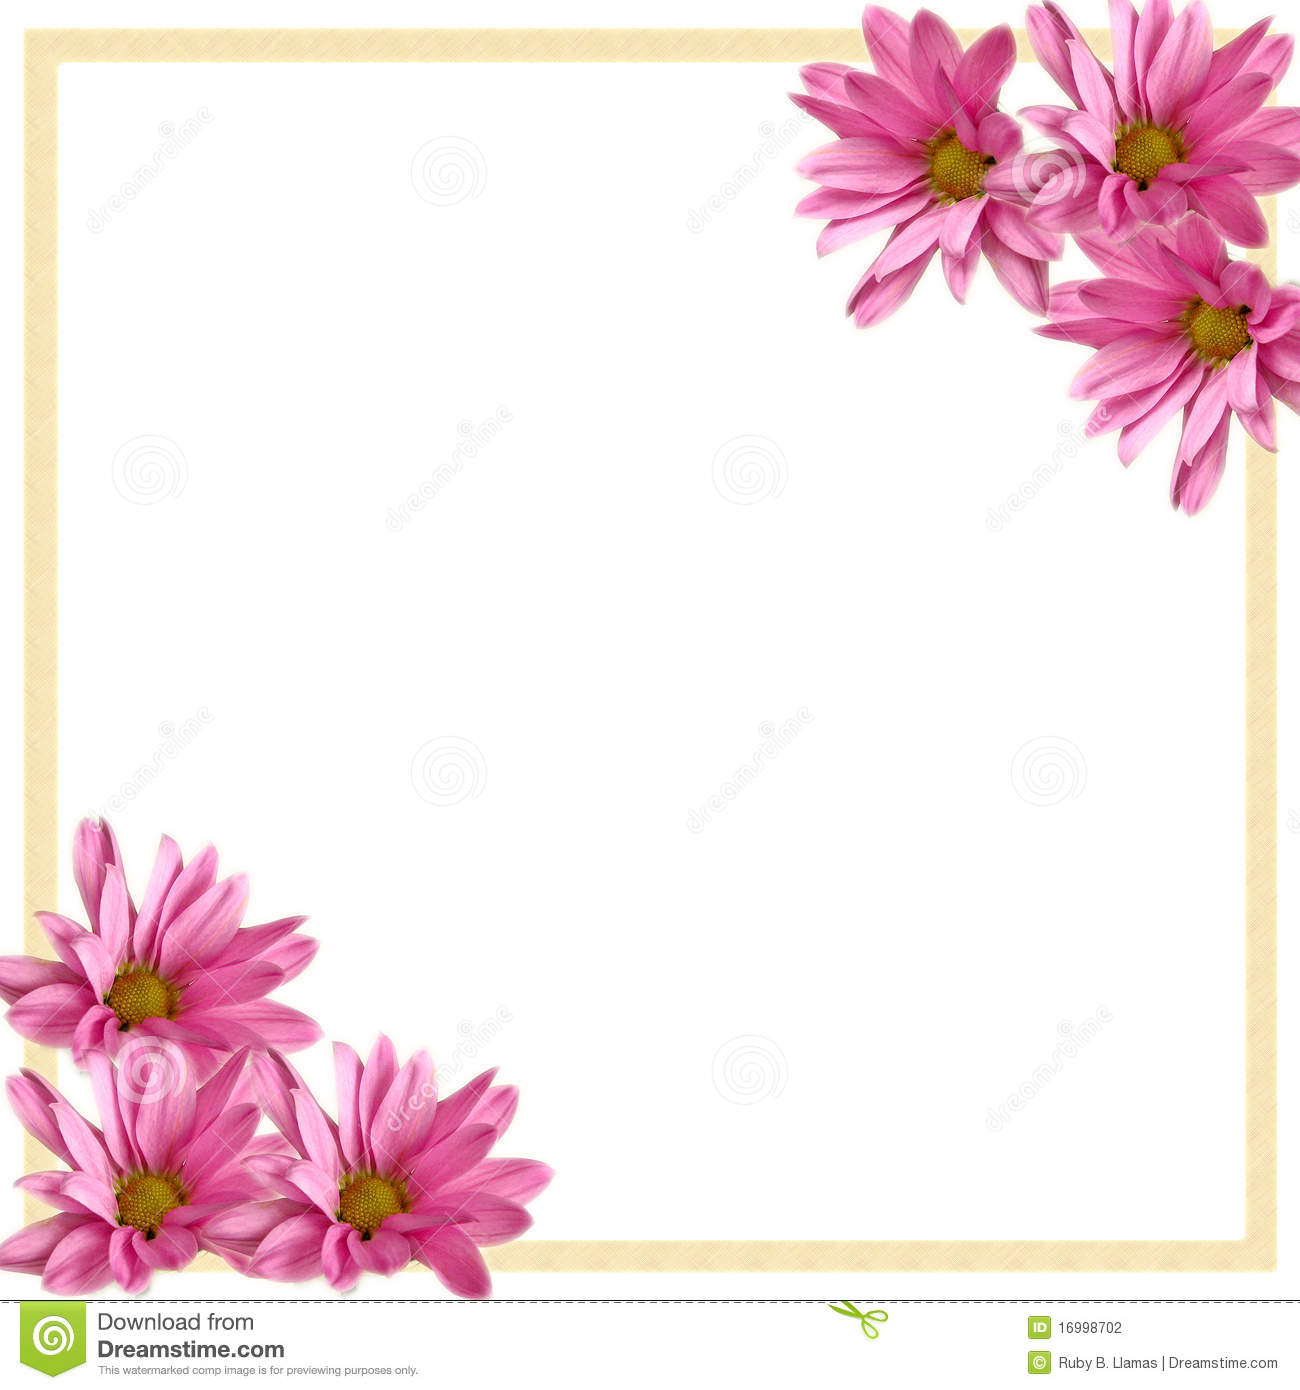 1300x1390px white daisy wallpaper border wallpapersafari pink flowers corner borders pc android iphone and ipad wallpapers 1300x1390 izmirmasajfo